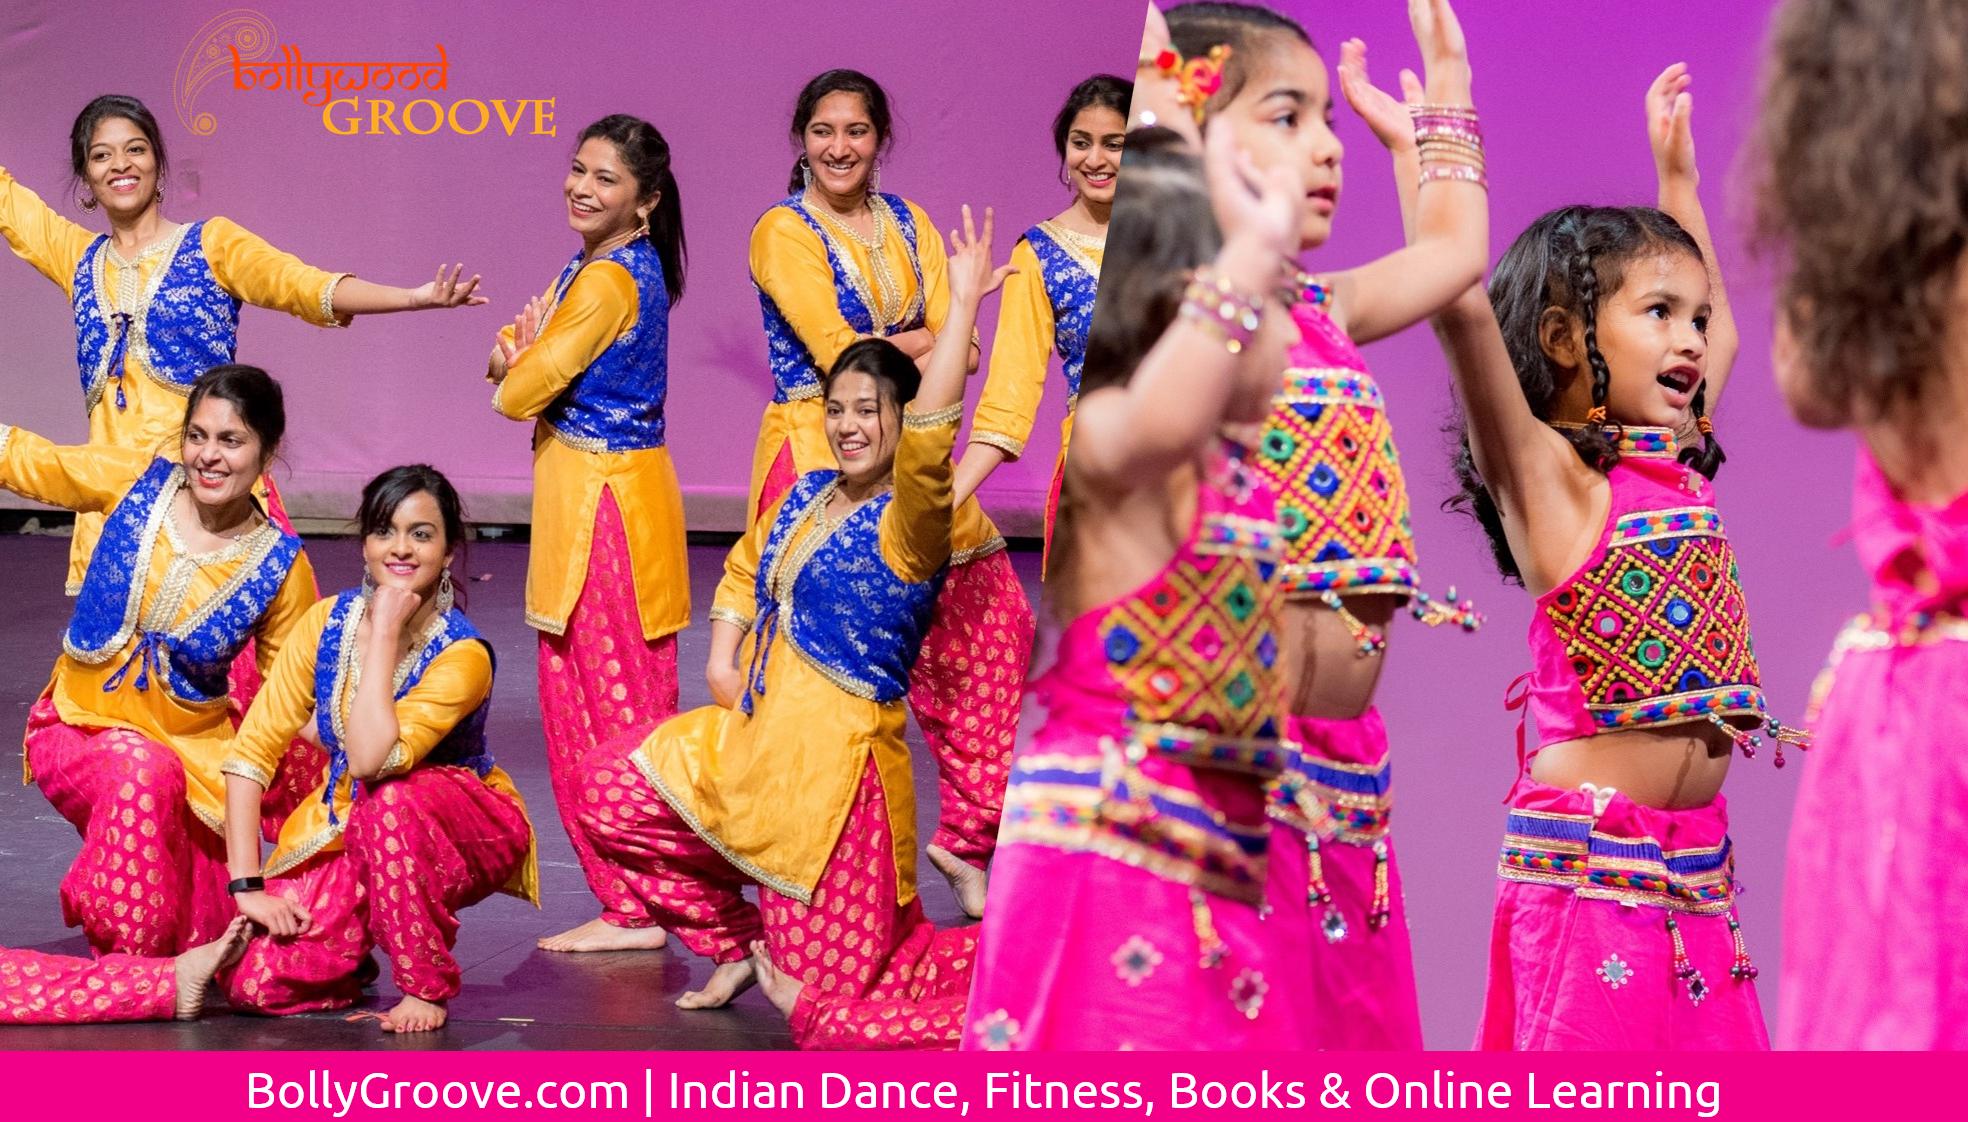 Stroller Grooves: Bollywood Groove